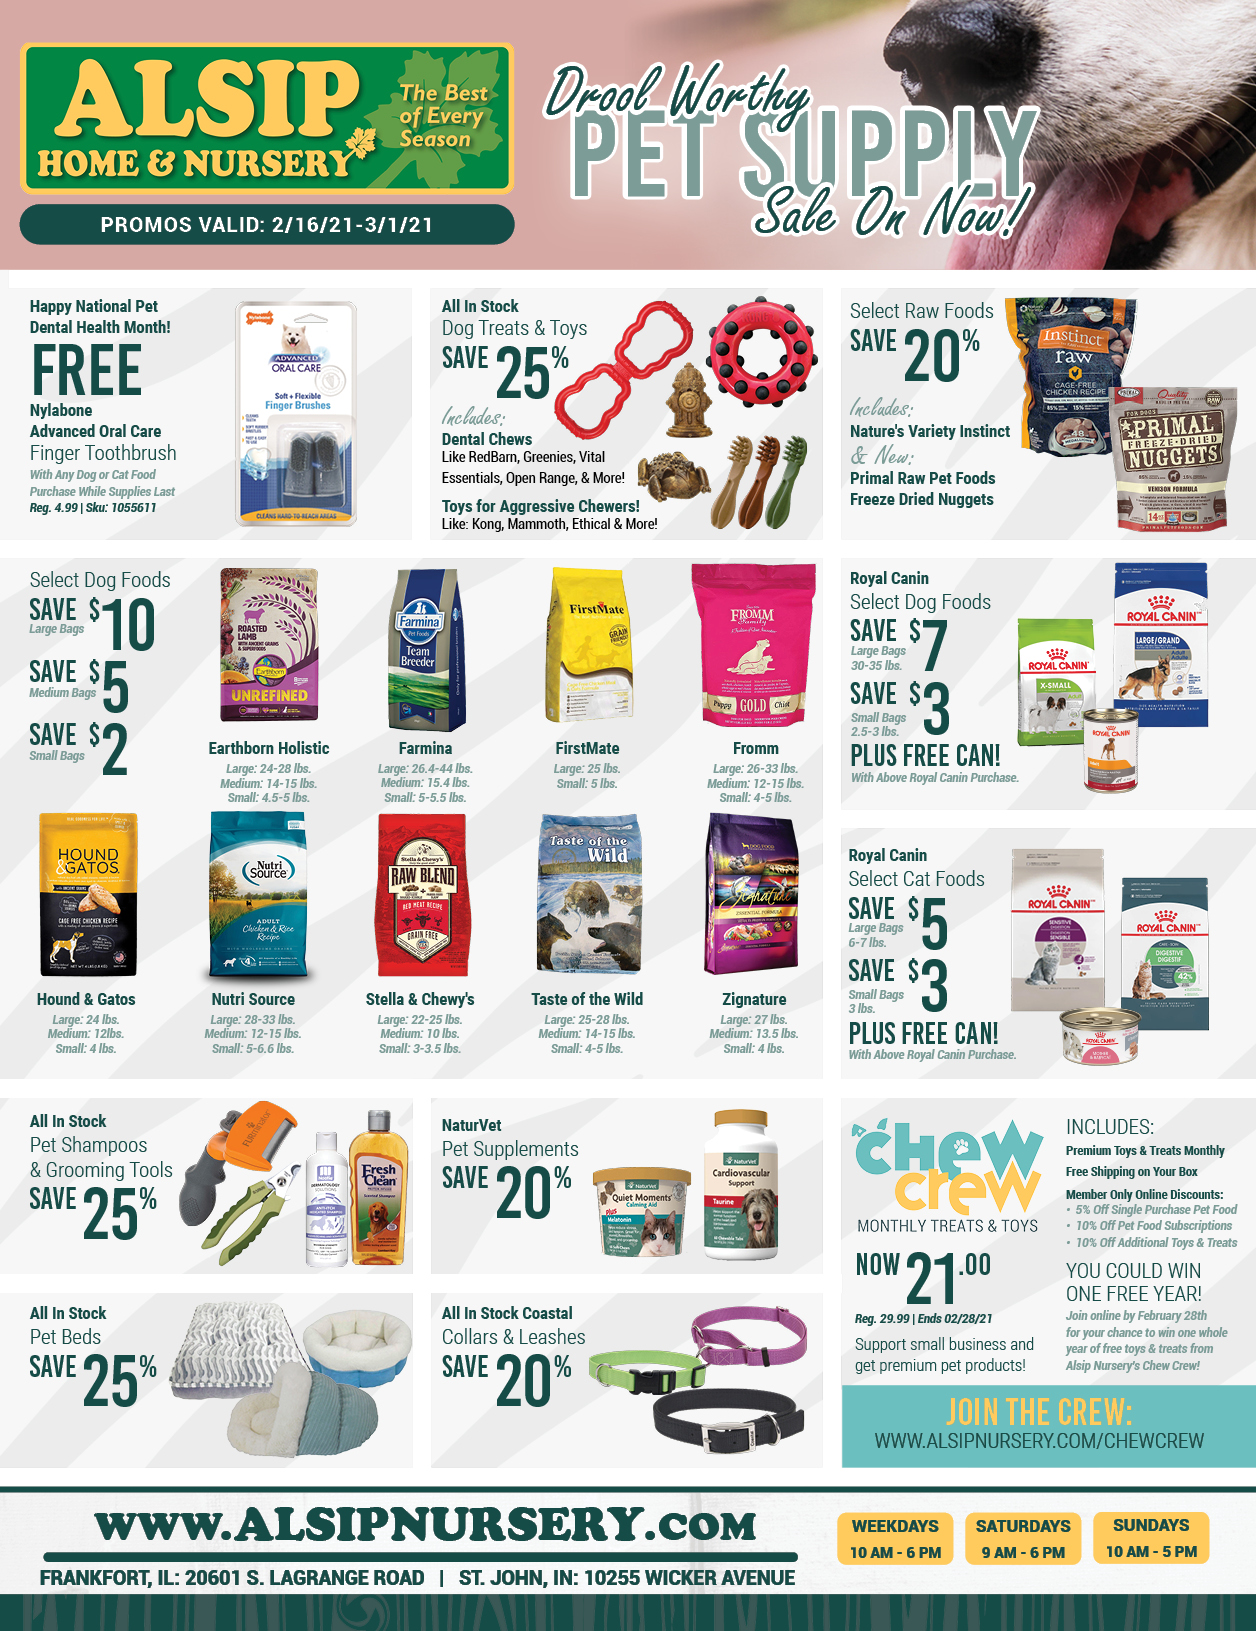 Drool Worthy Pet Supply Savings From Alsip Home & Nursery - Valid Promo Dates Apply